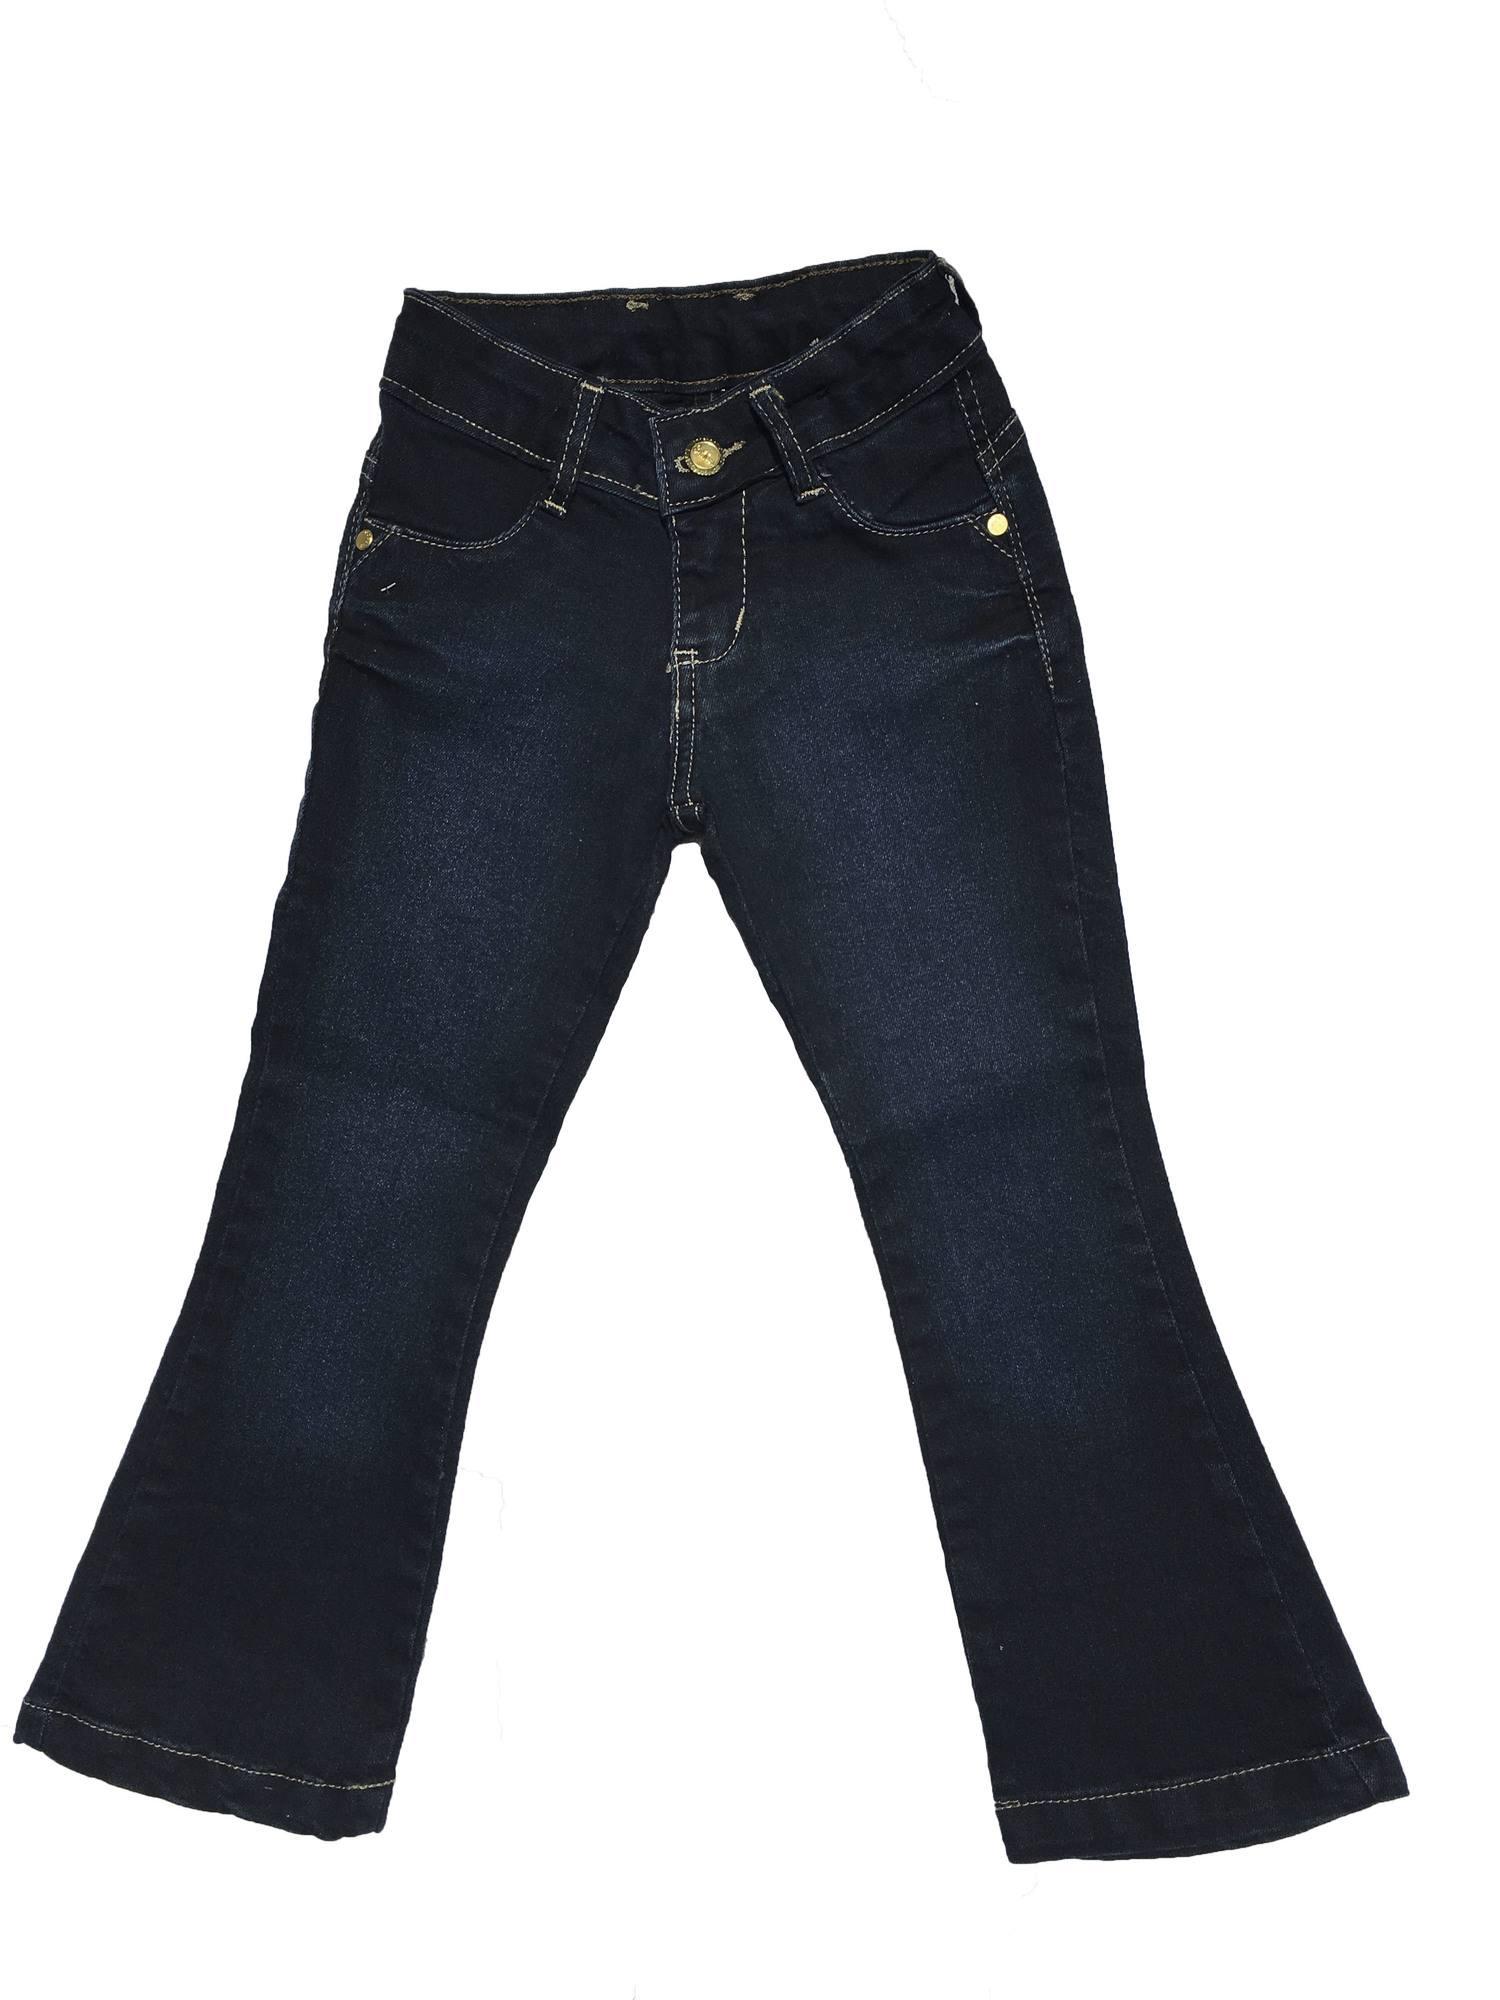 Calça Jeans Flare Feminina Infantil [427]